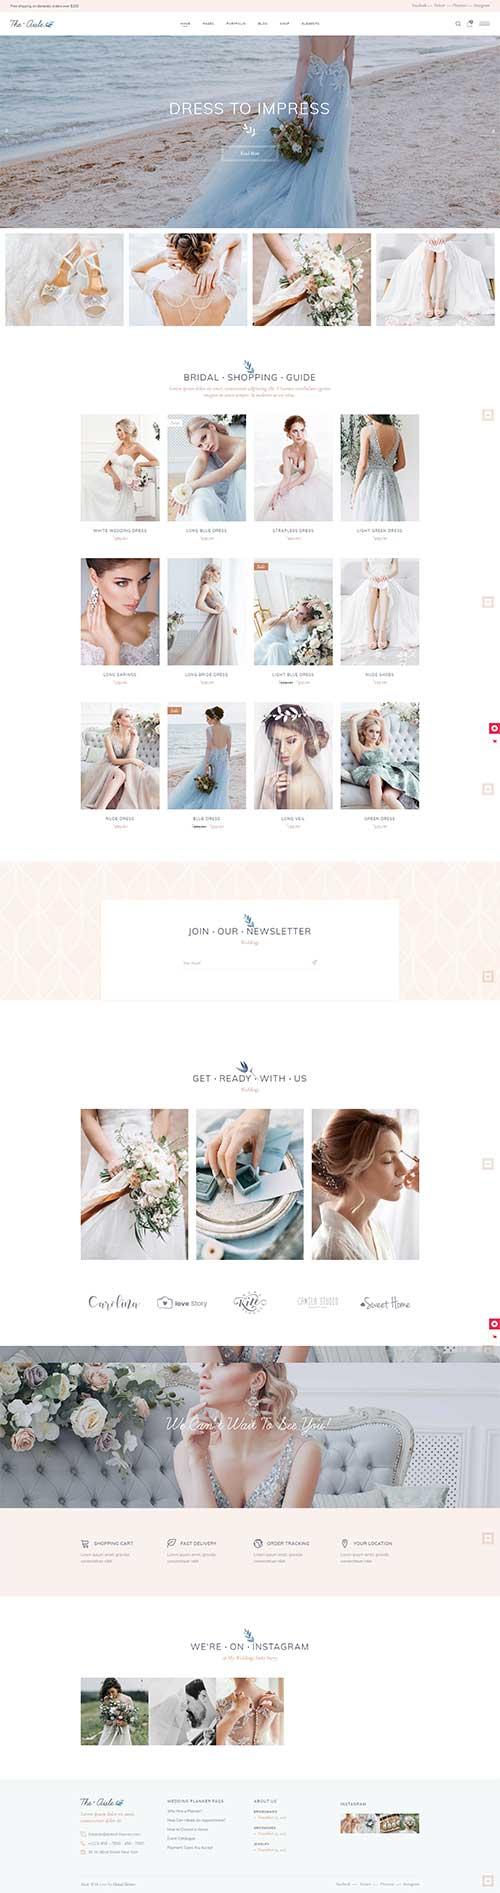 Website Shop váy cưới The Aisle